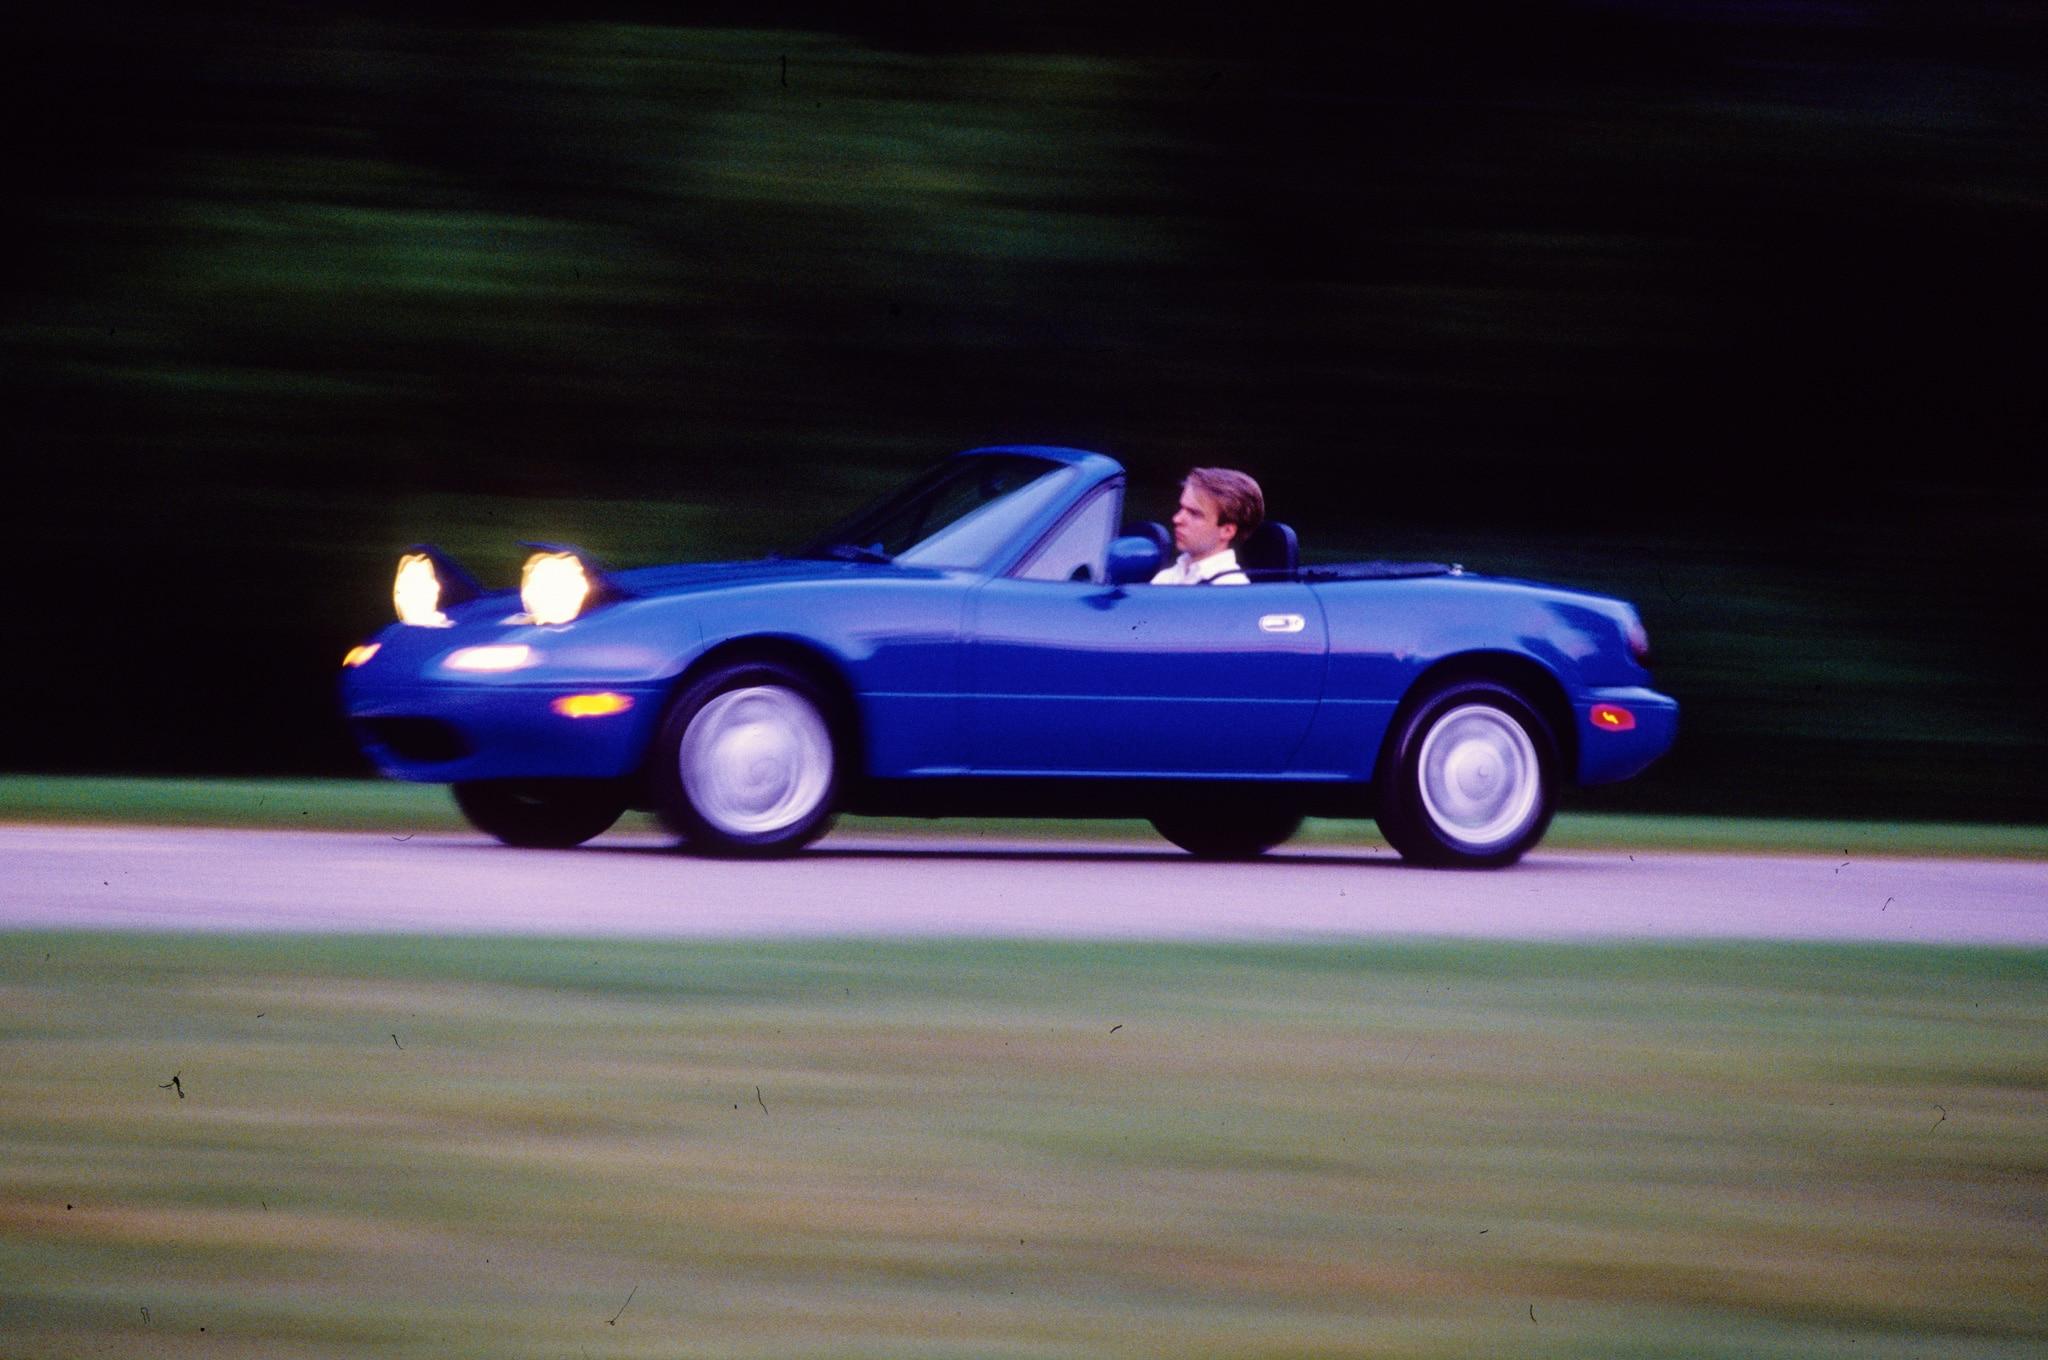 1990 Mazda MX 5 Miata Side View At Speed